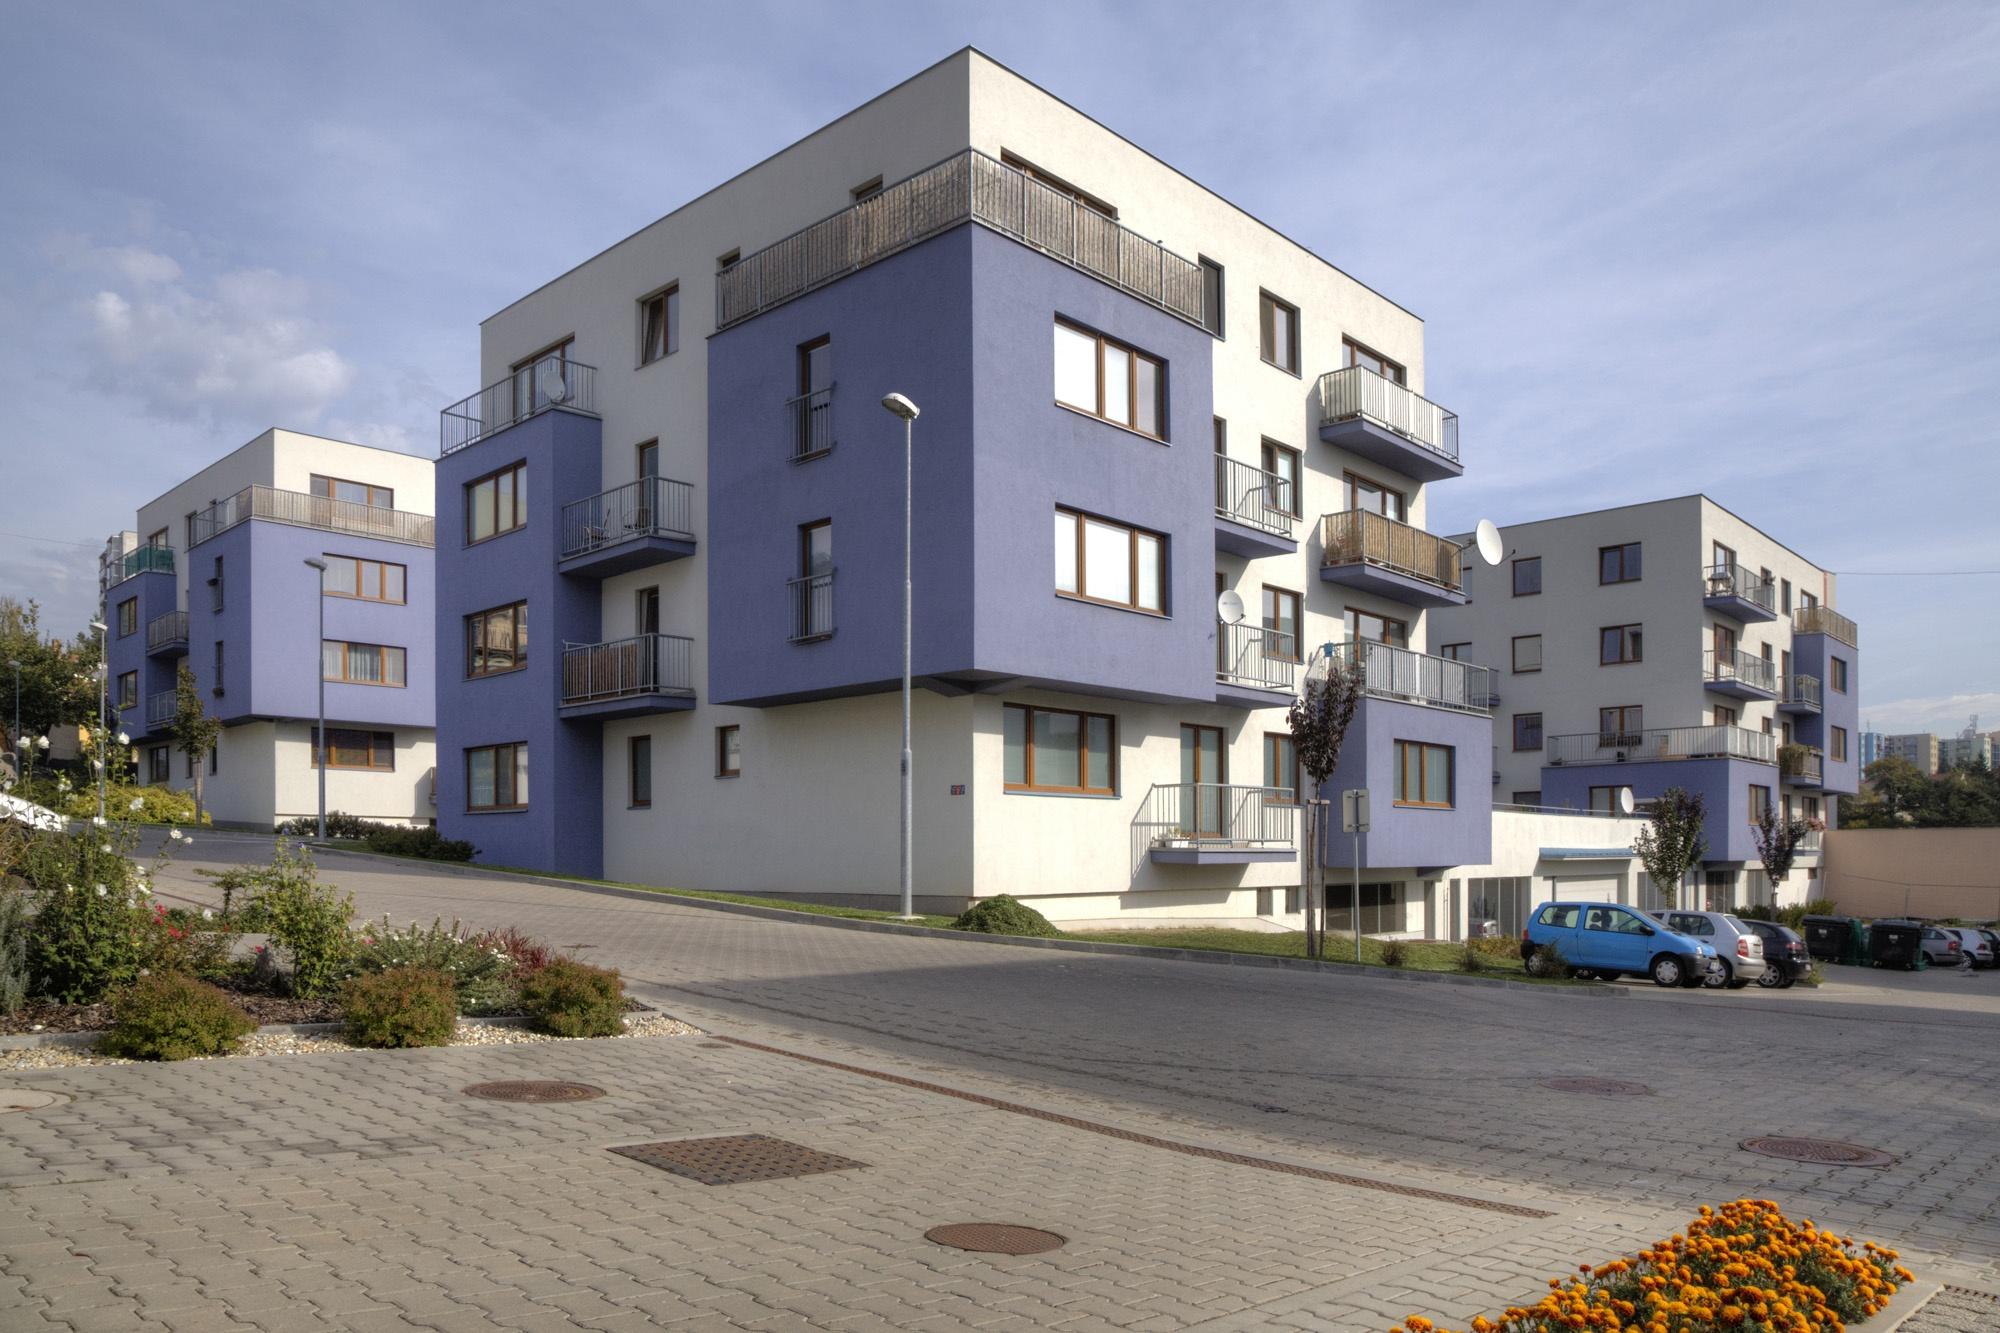 Brno / Bohunice